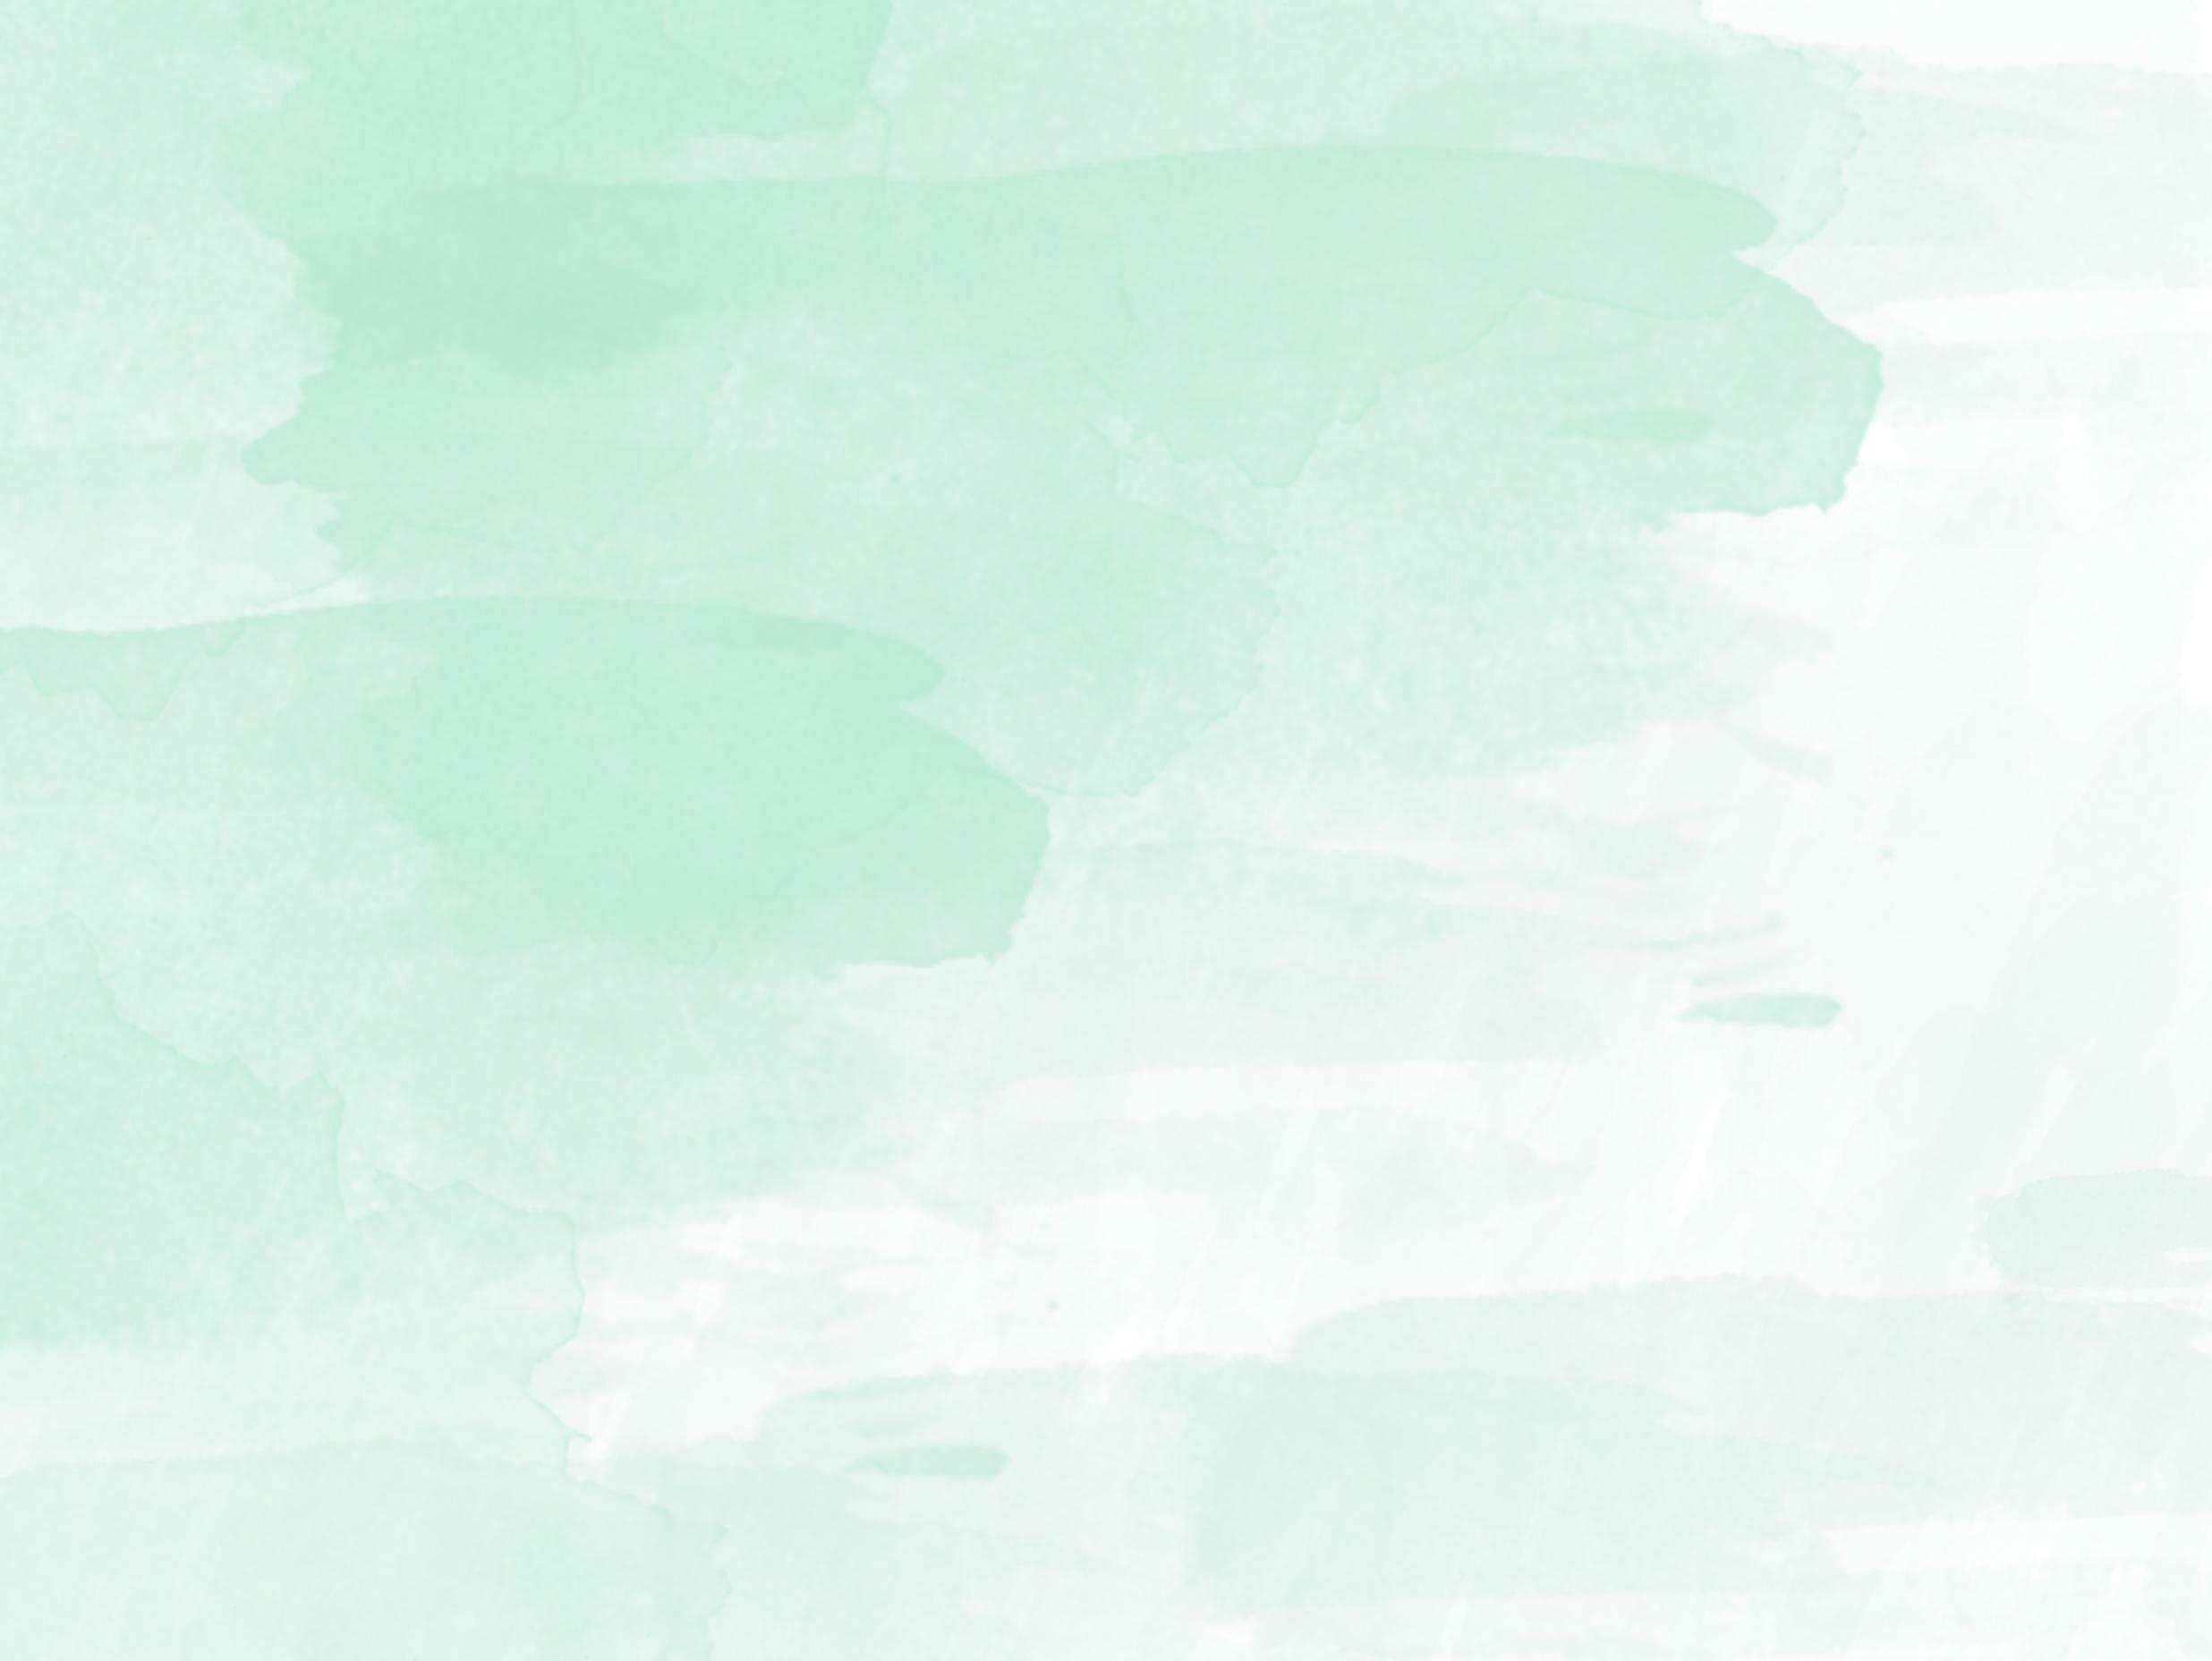 Watercolor Background Desktop Wallpaper Pastel Mint Green Background 30320 Hd Wallpaper Backgrounds Download